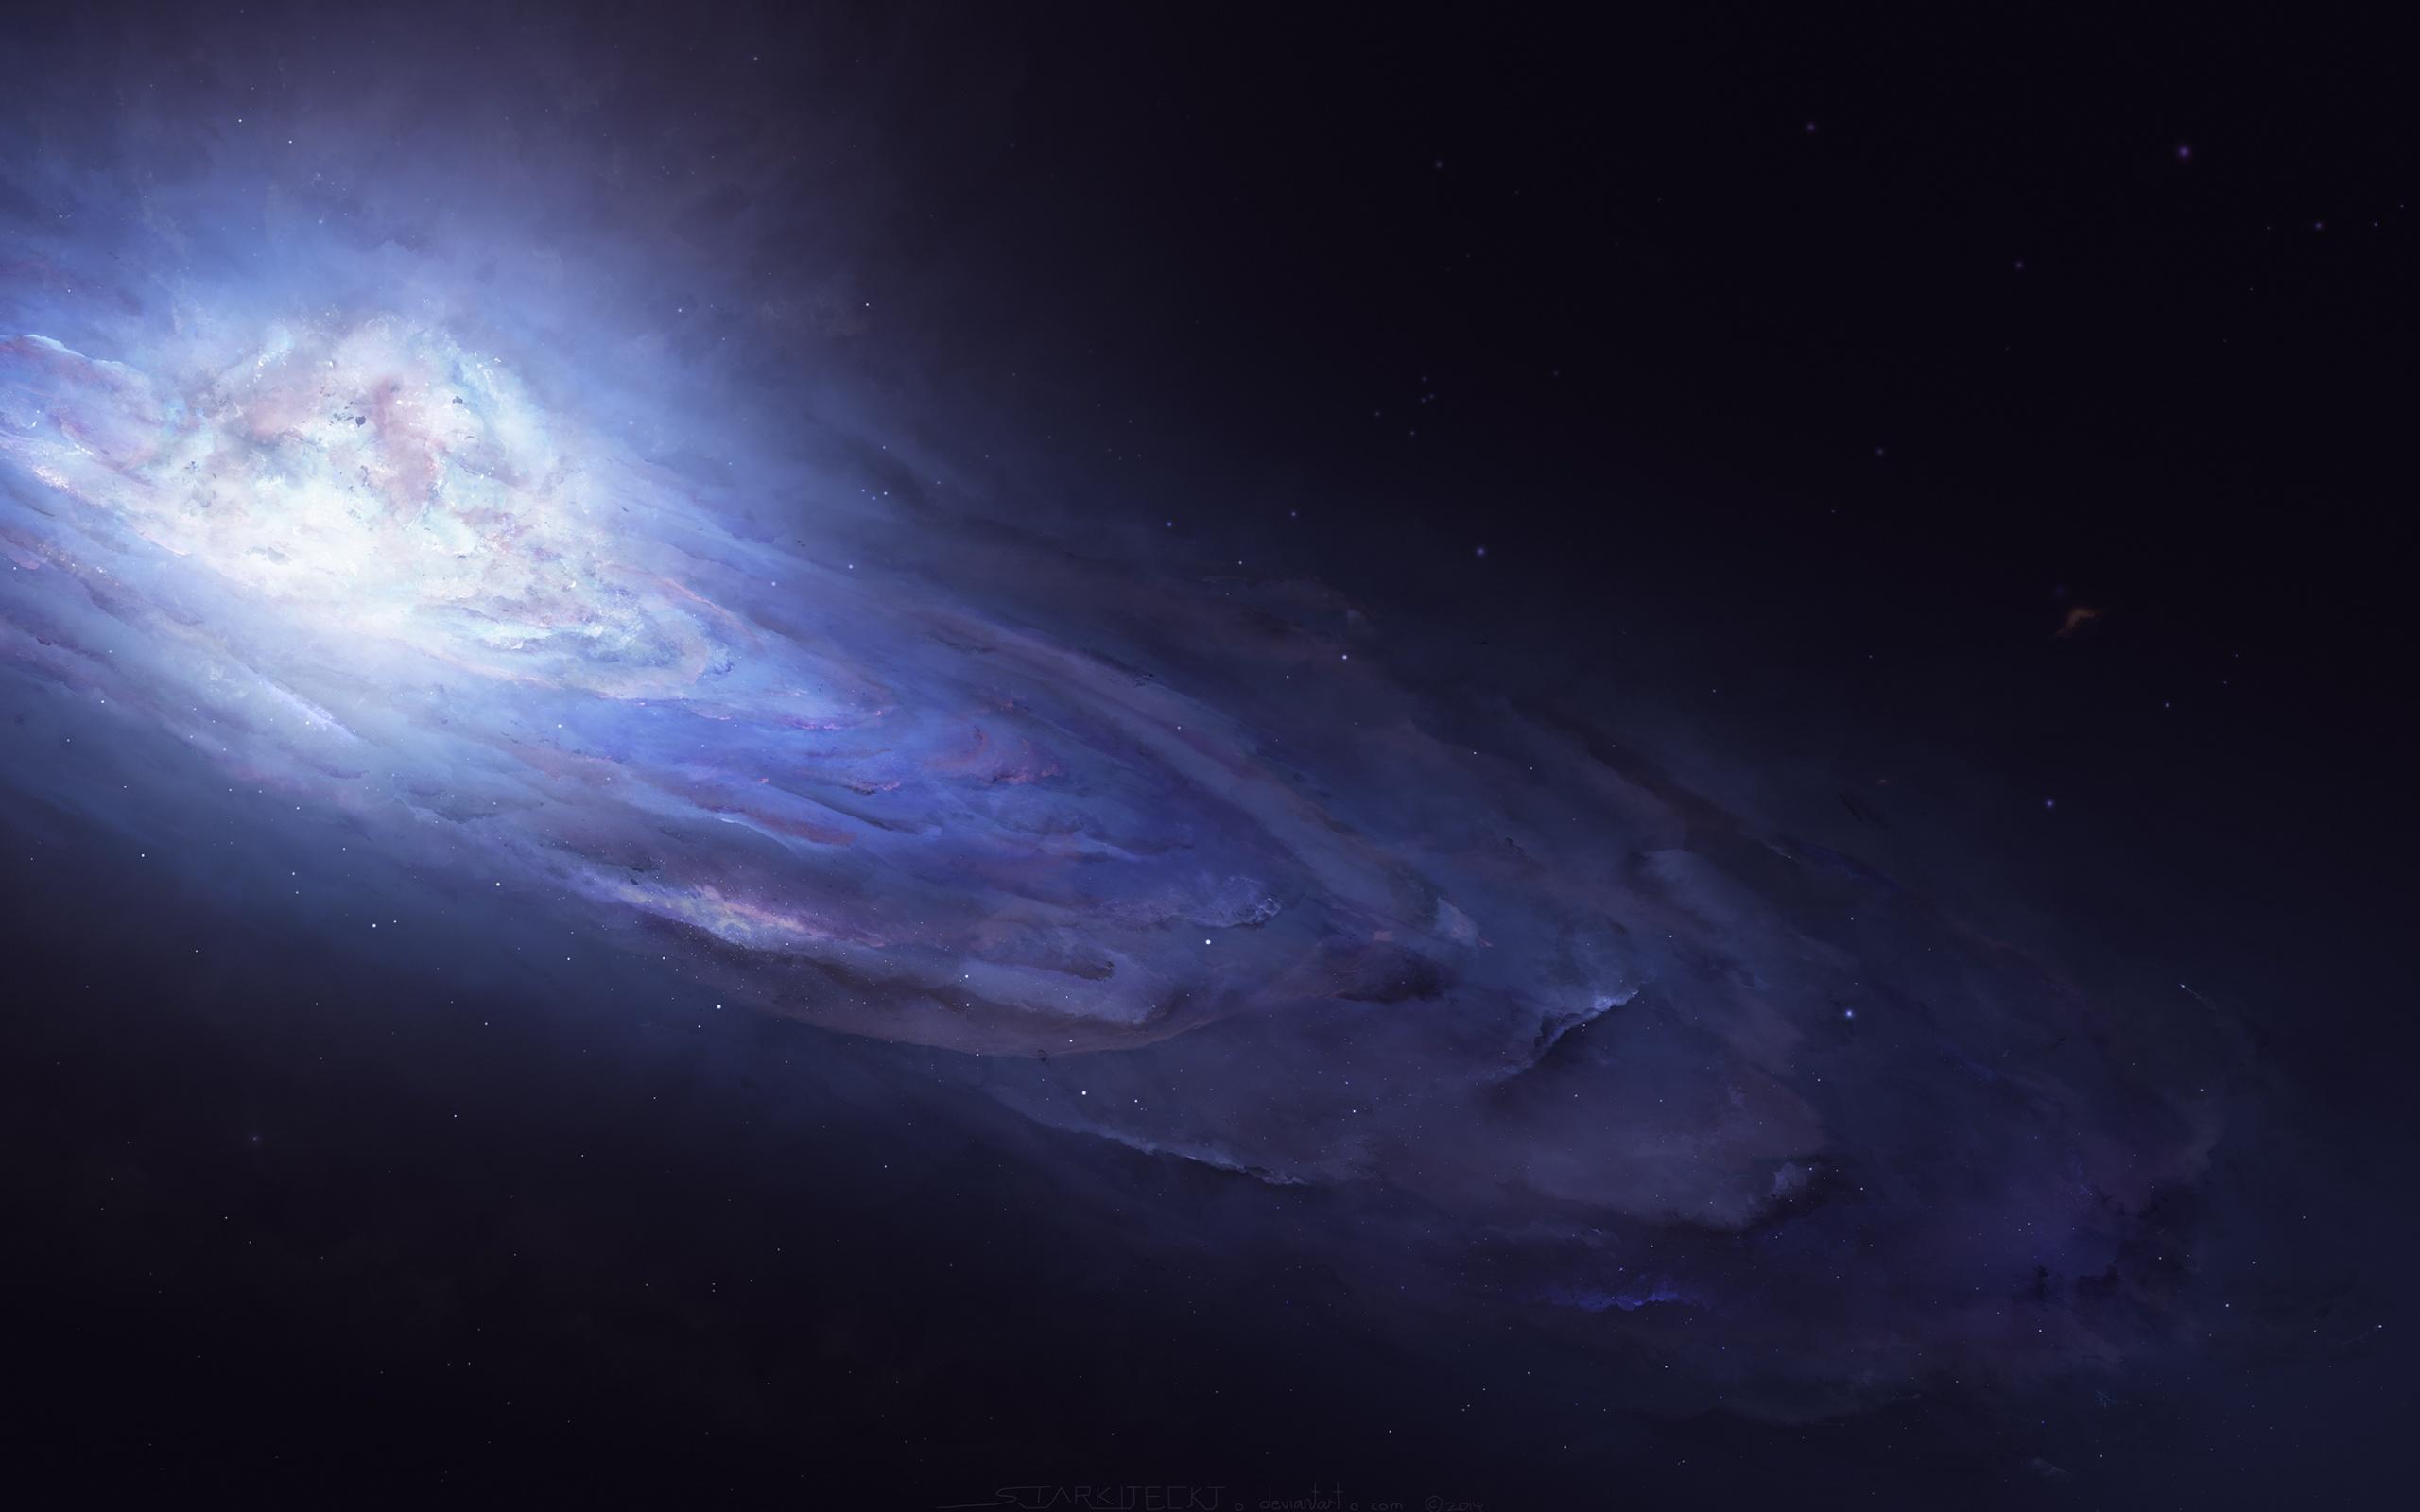 Andromeda Galaxy Wallpapers HD Wallpapers 2560x1600